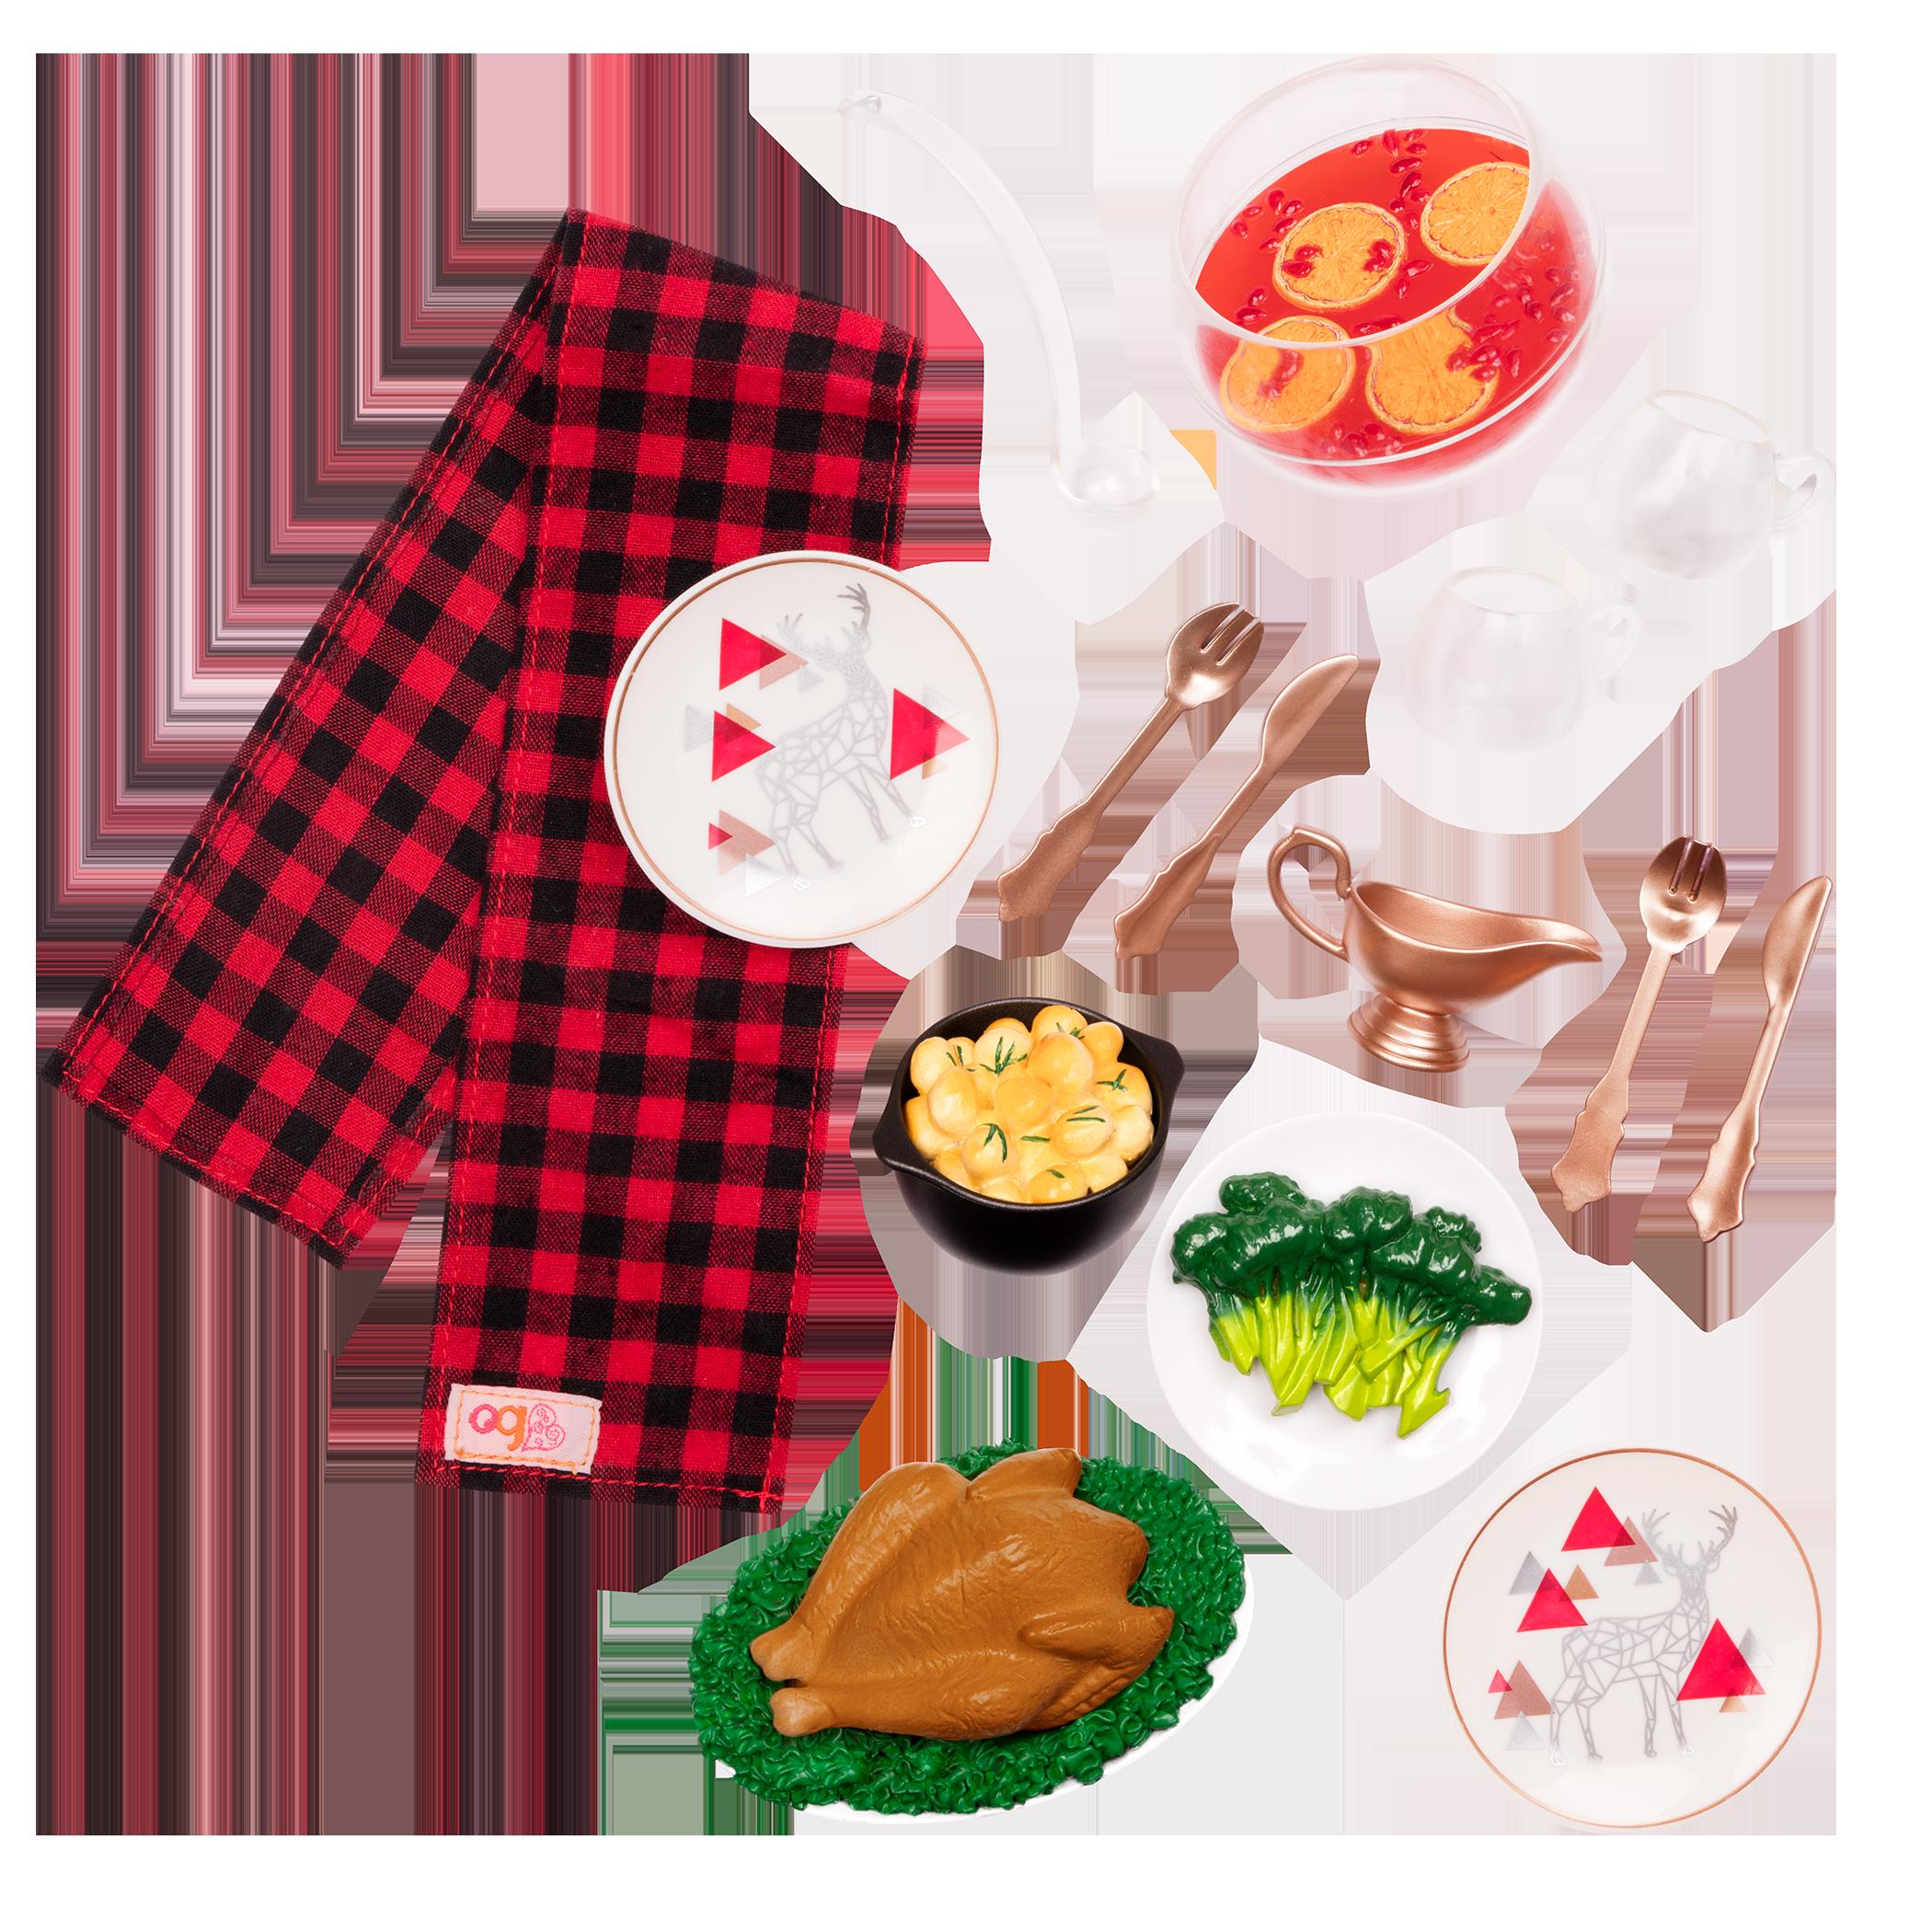 Festive Feast turkey dinner set for 18-inch dolls